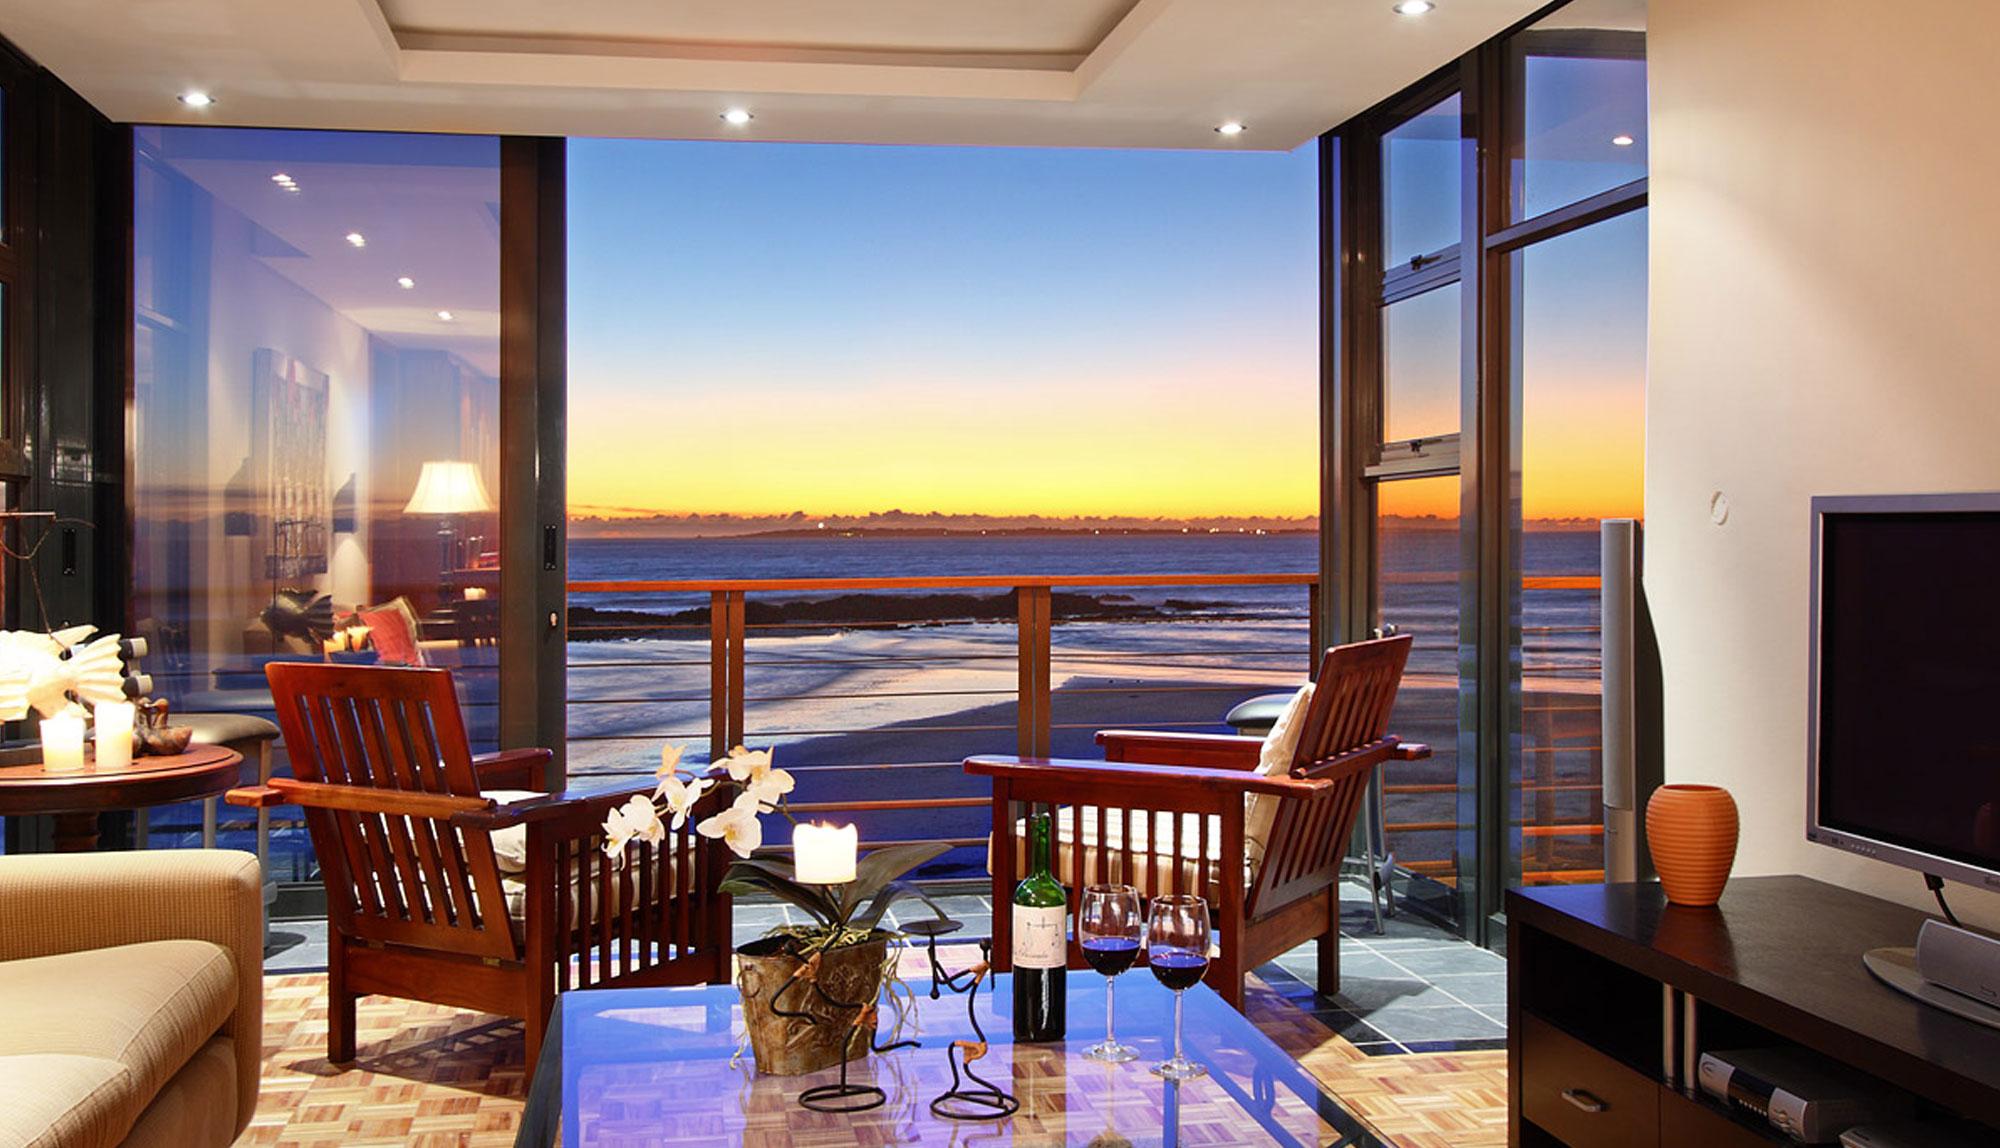 Big bay accommodation holiday rentals in villas and apartments